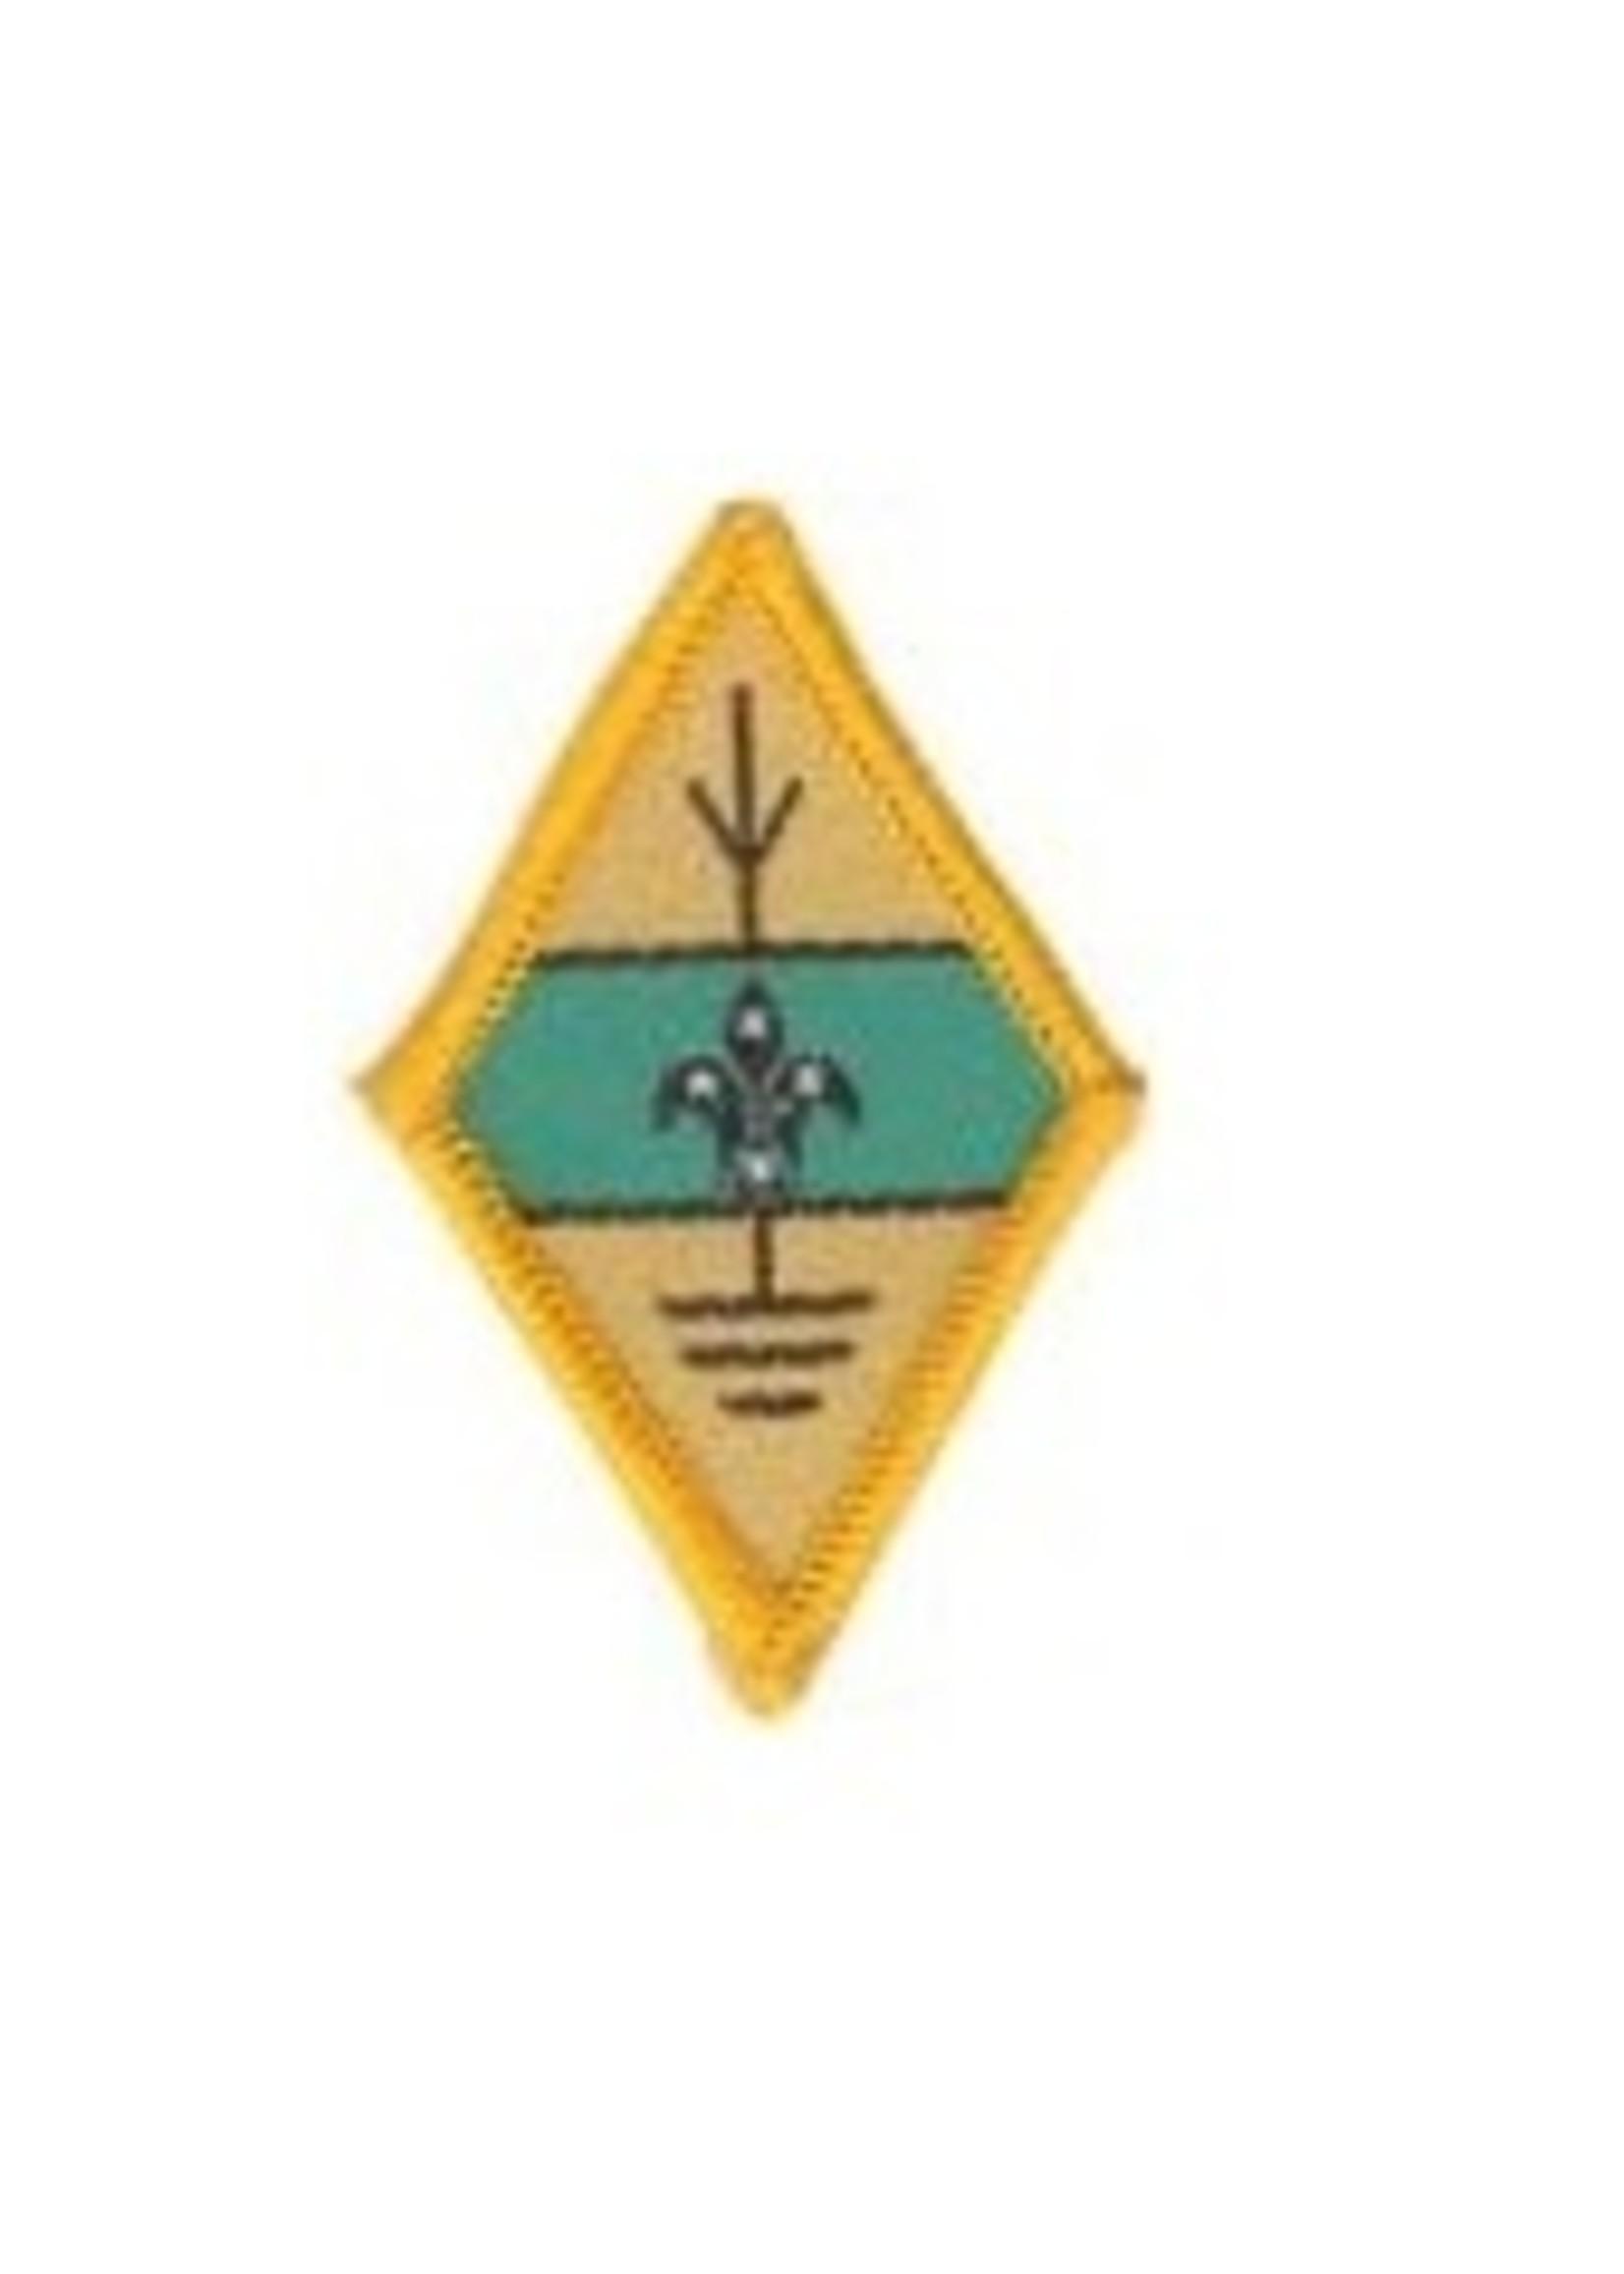 Amateur Radio Operator Badge